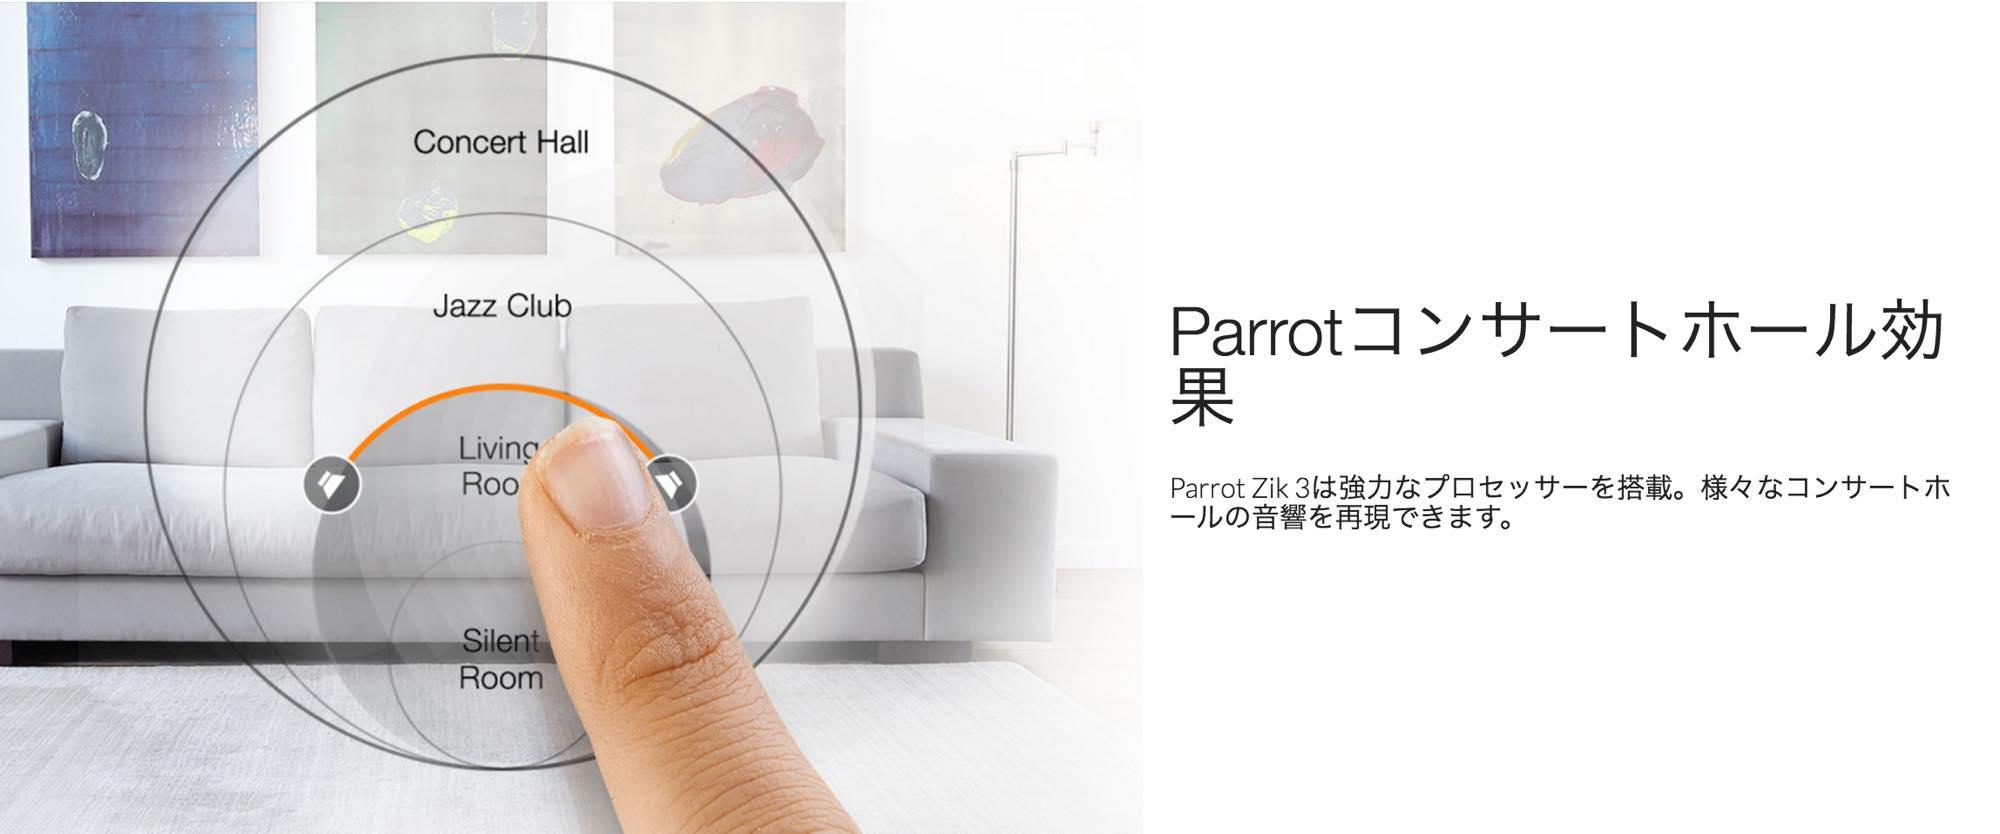 parrot-zik3-info4